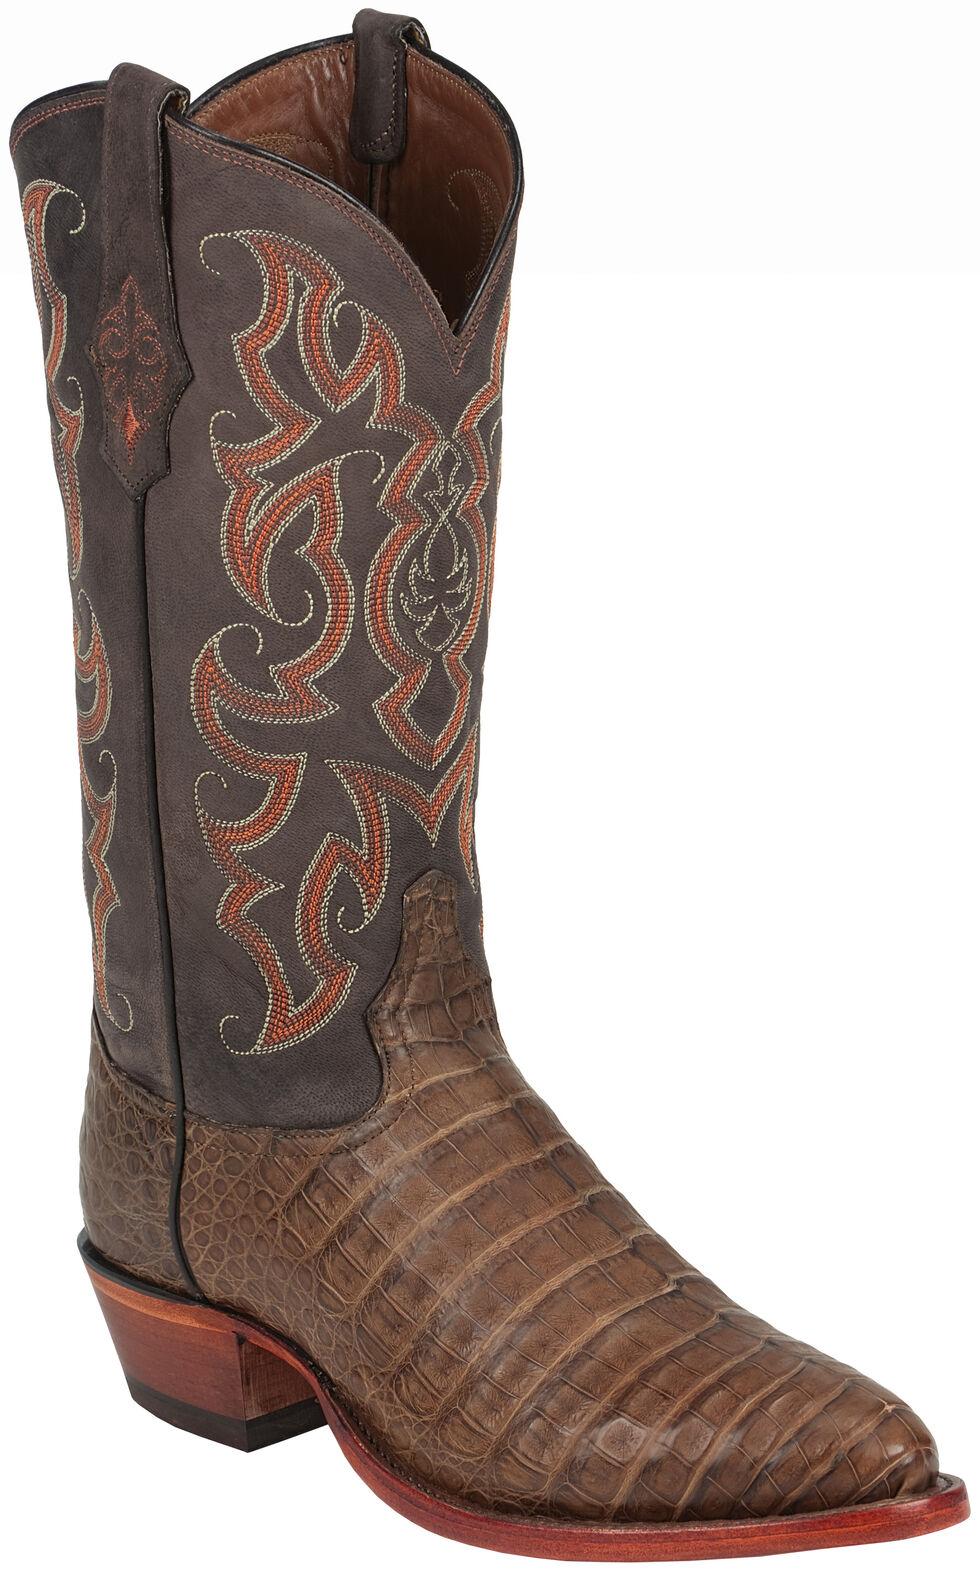 Tony Lama Chocolate Vintage Belly Exotics Caiman Western Boots - Medium Toe  , Chocolate, hi-res